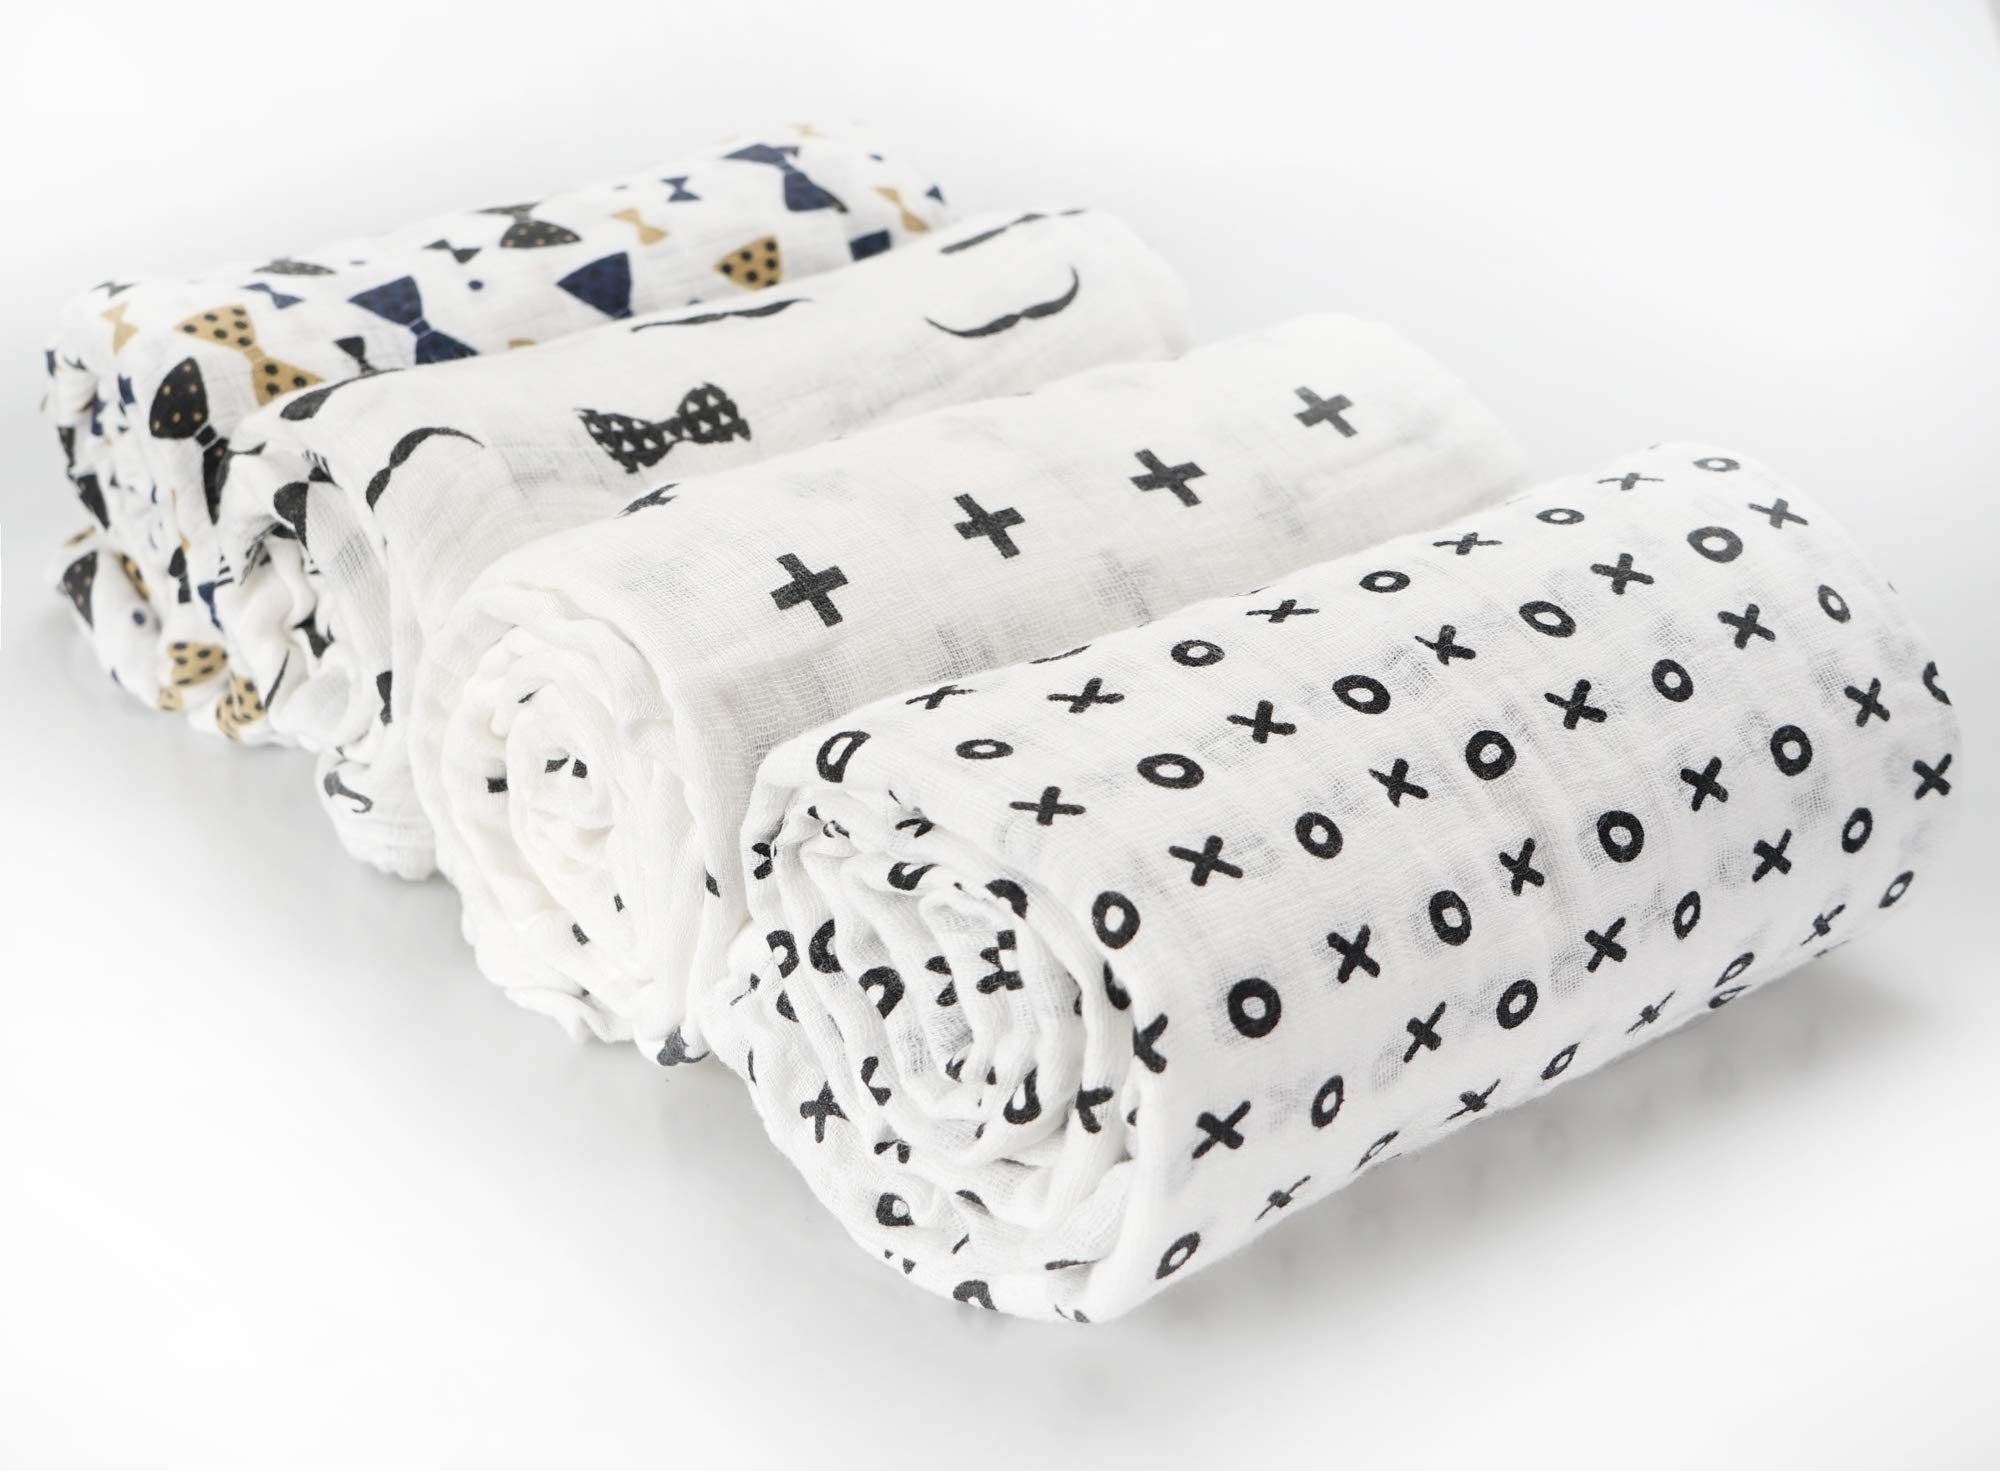 CozyWay Baby Muslin Swaddle Blankets – Baby Cotton Blanket Boys/Girls/Unisex 4 Pack, Swaddle Wrap, Receiving Blankets, Bath Towel, Newborn Shower Gifts, 47x47 (Bowtie & Moustache)